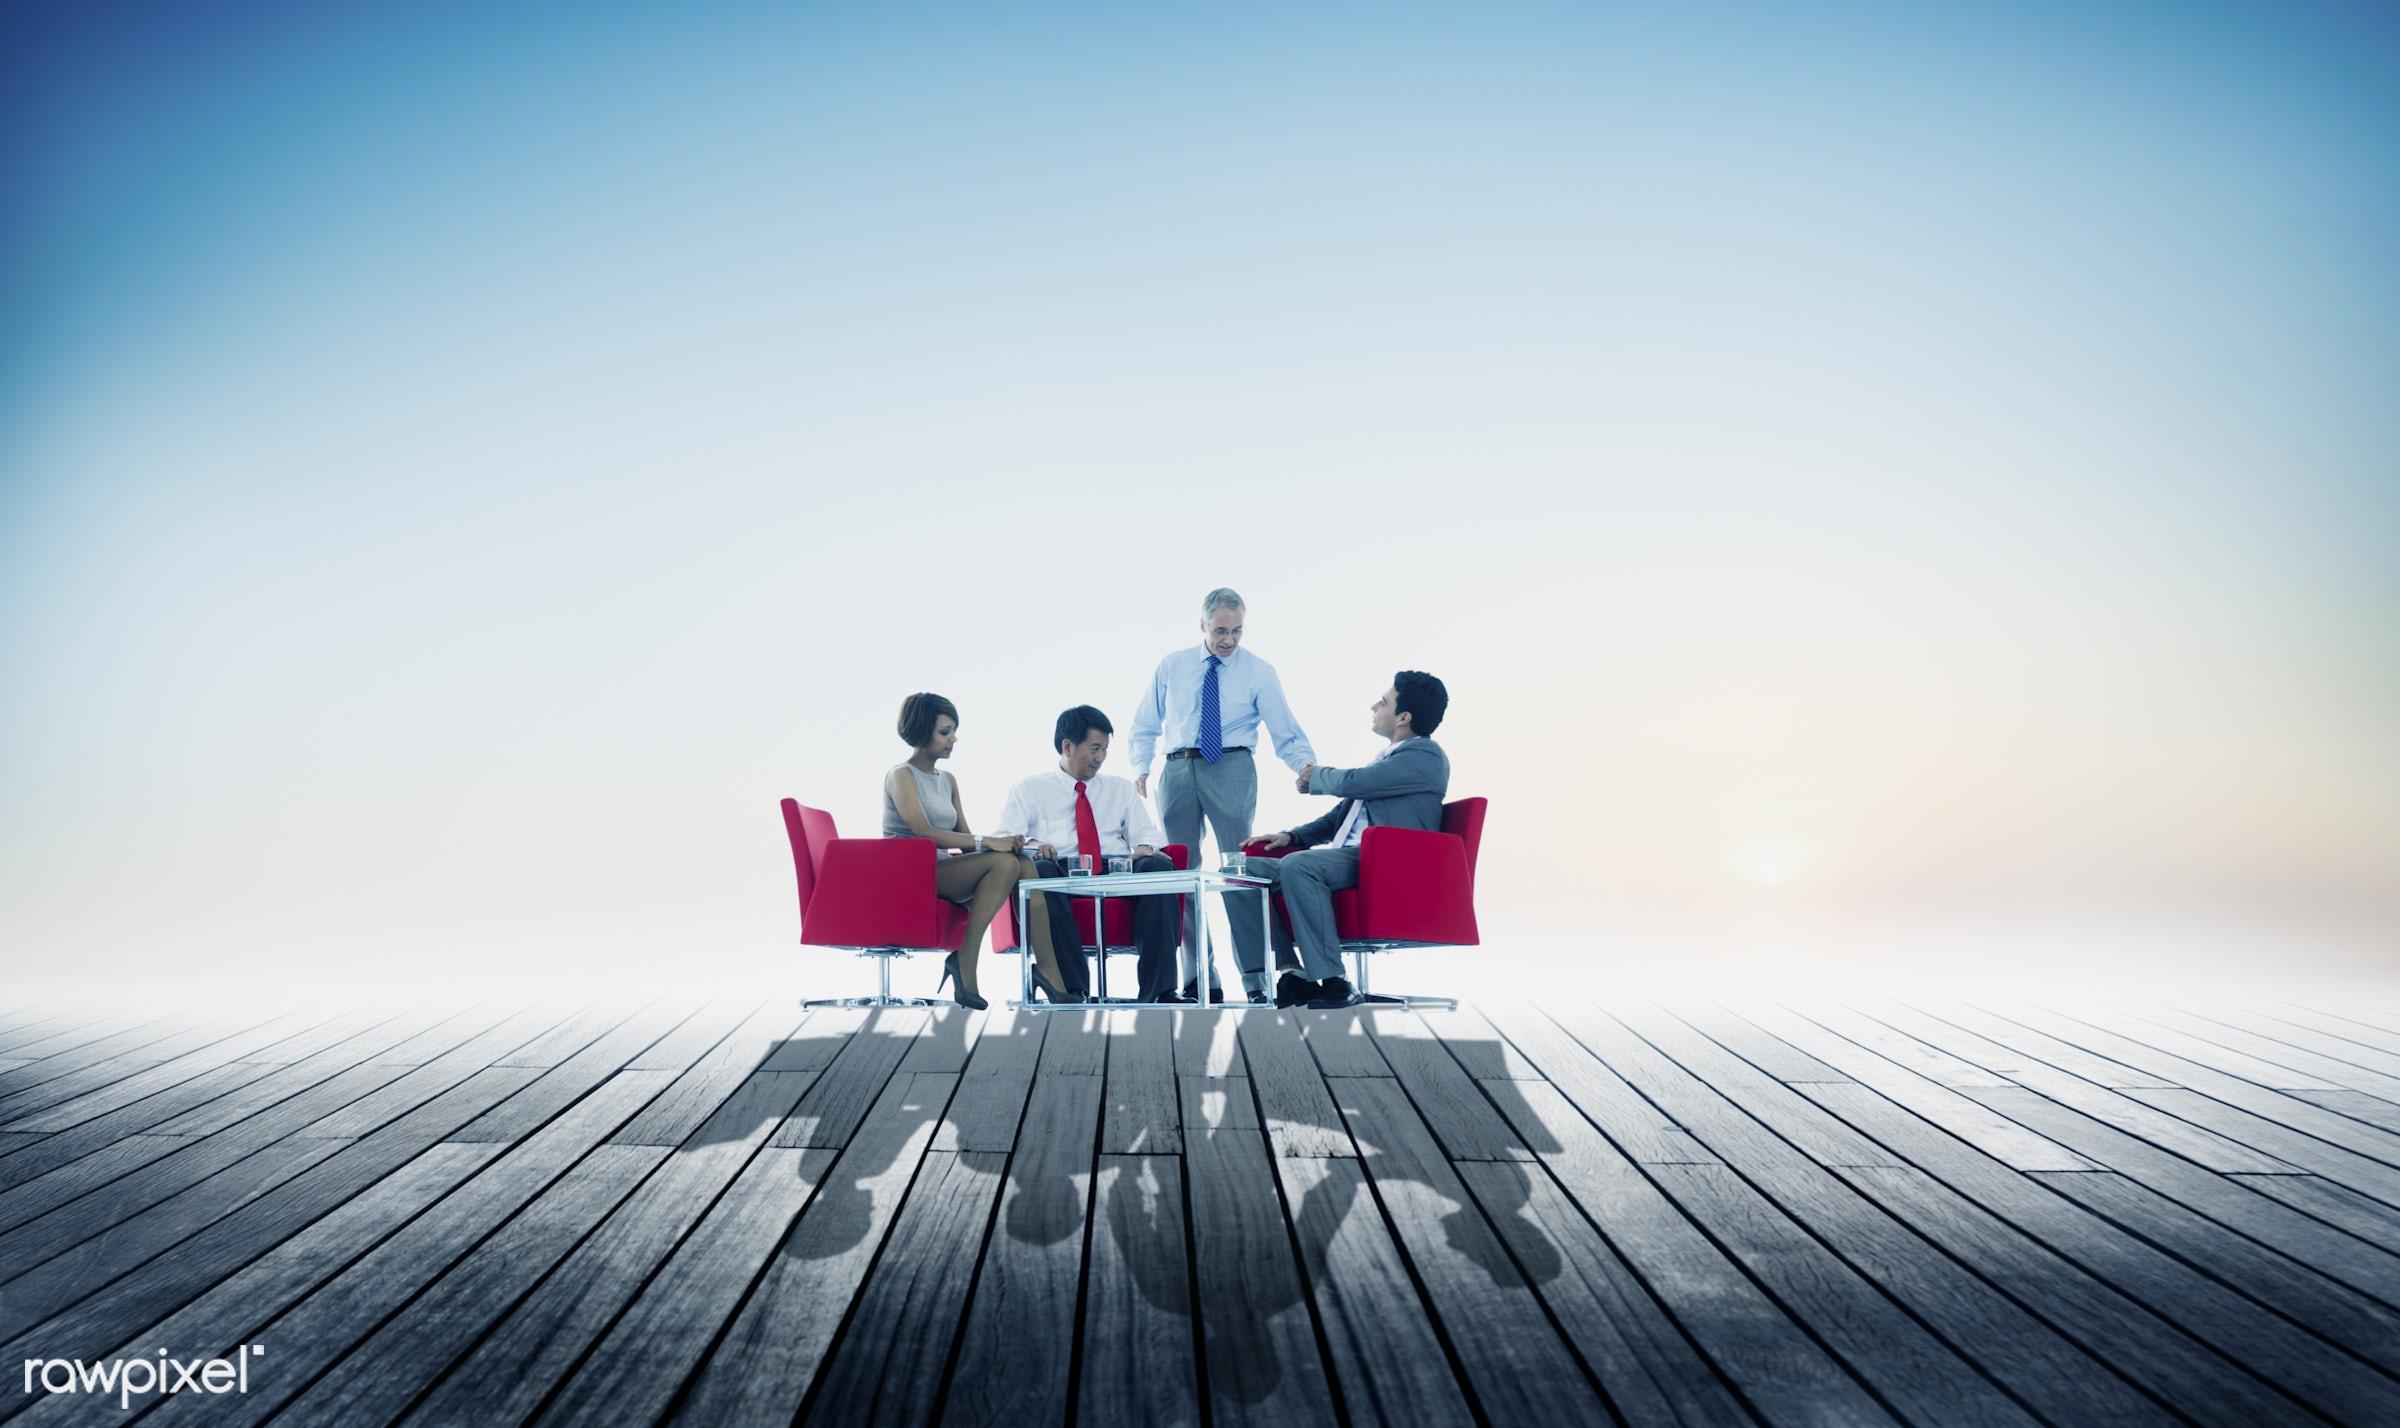 brainstorming, business, business people, businessmen, businesswomen, cloud, cloudy, colleague, communication, conference,...